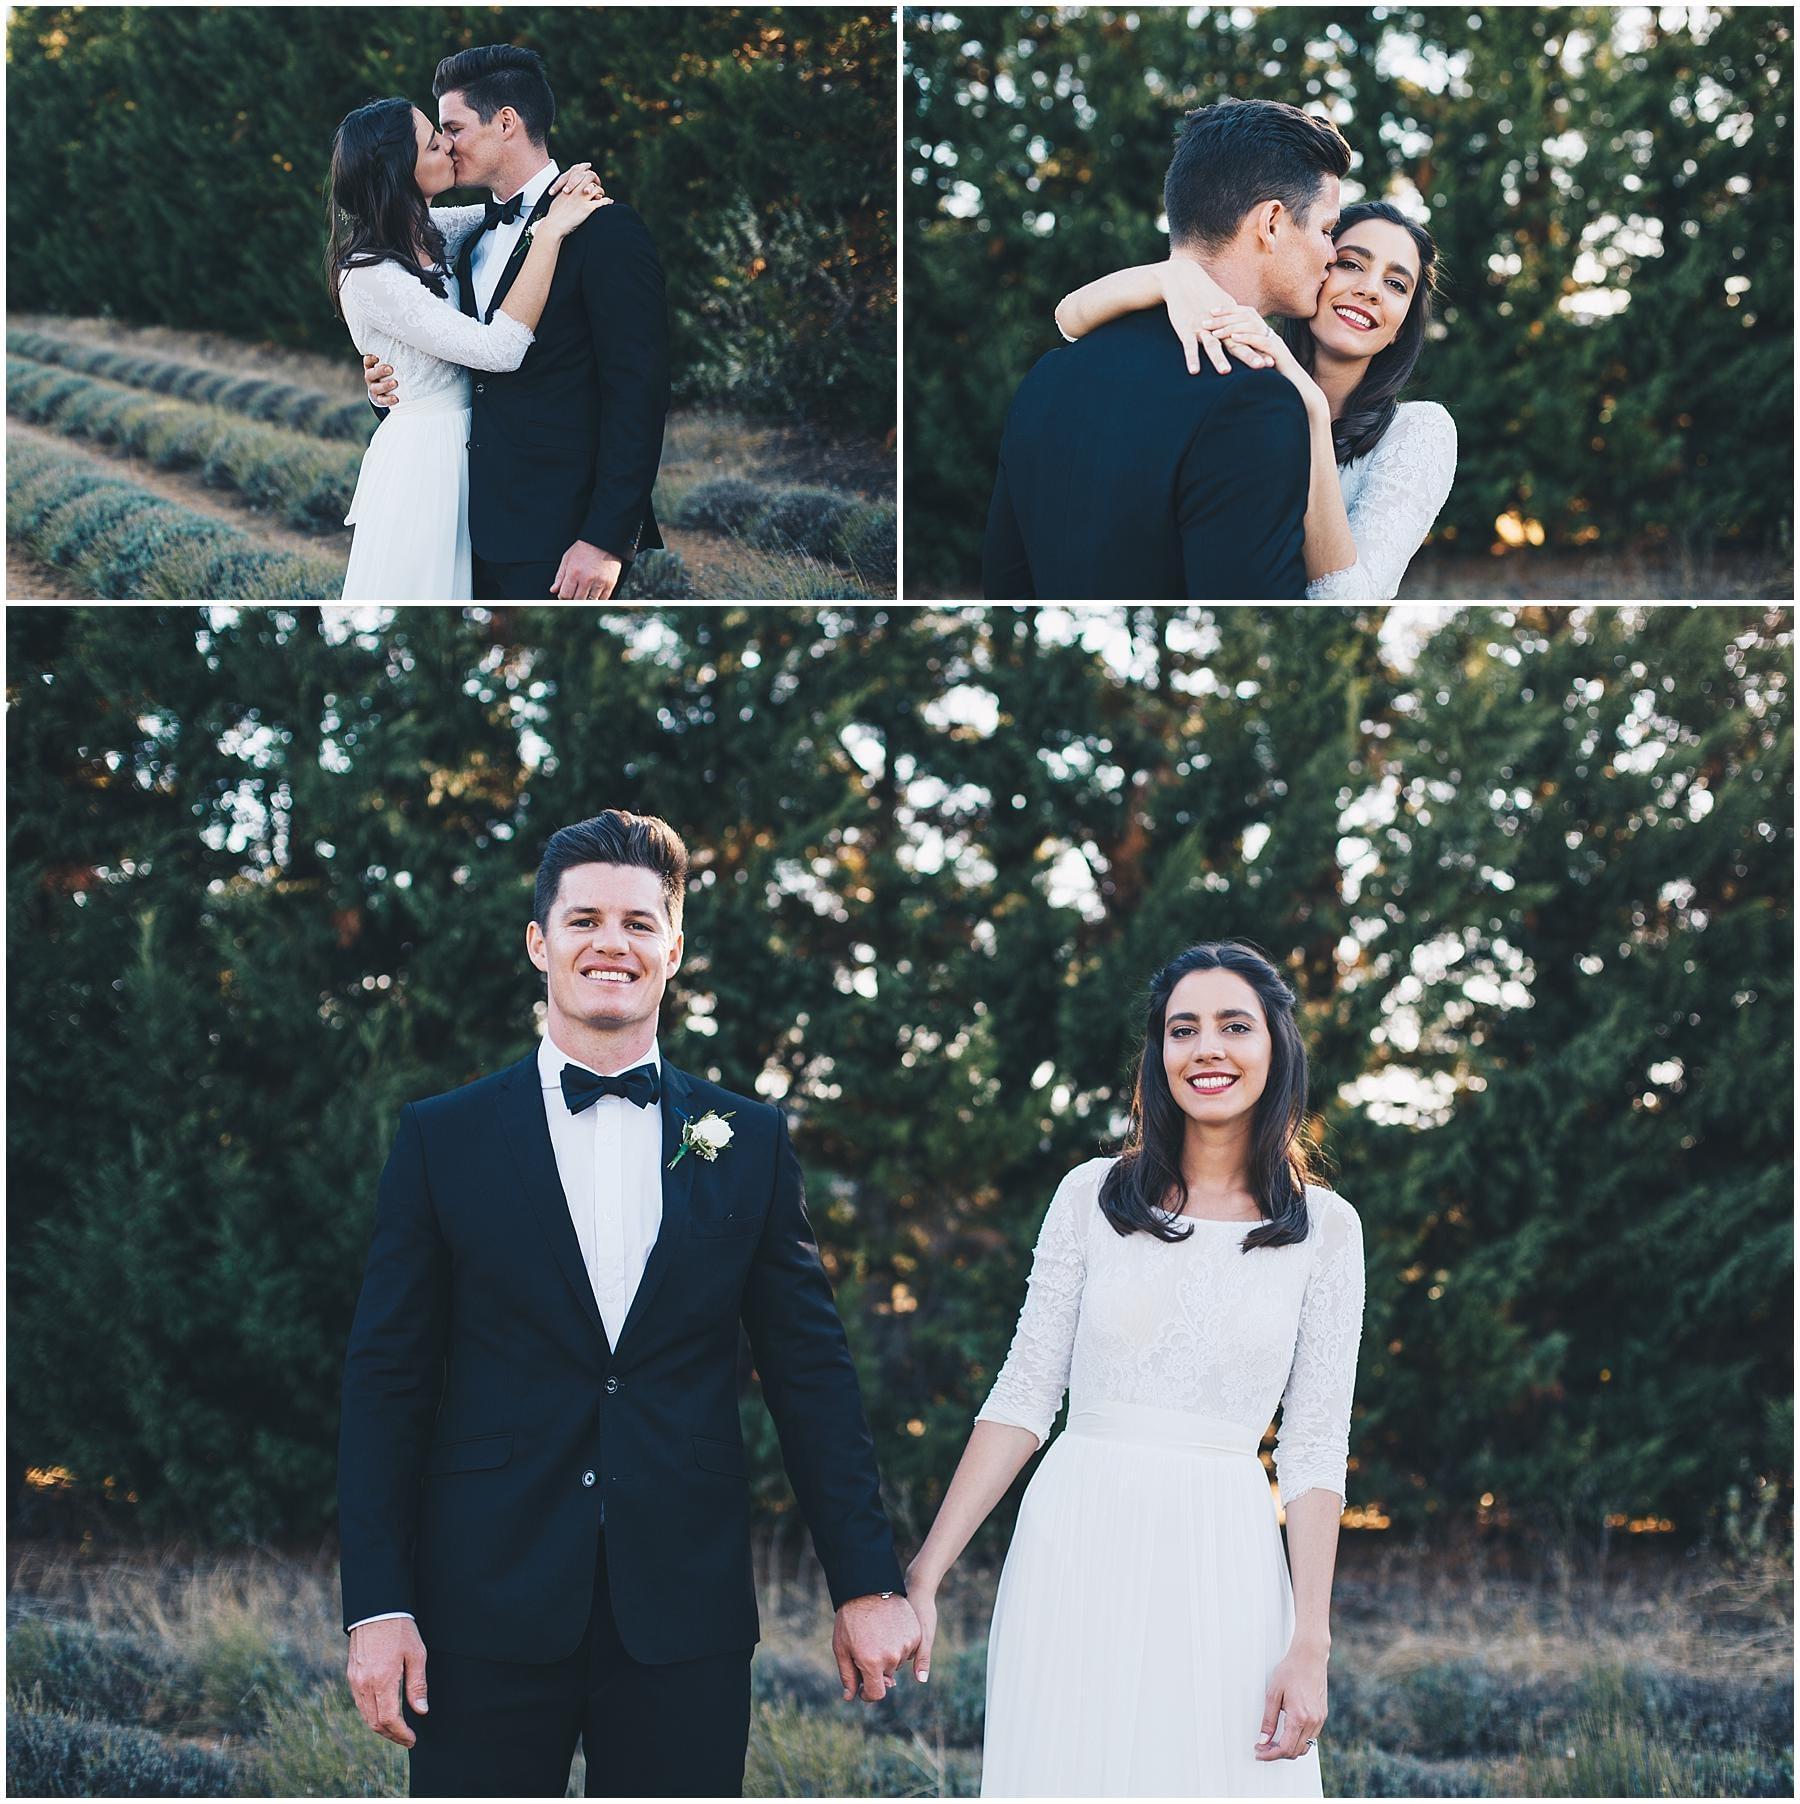 Zack & Kelsey_0046.jpg